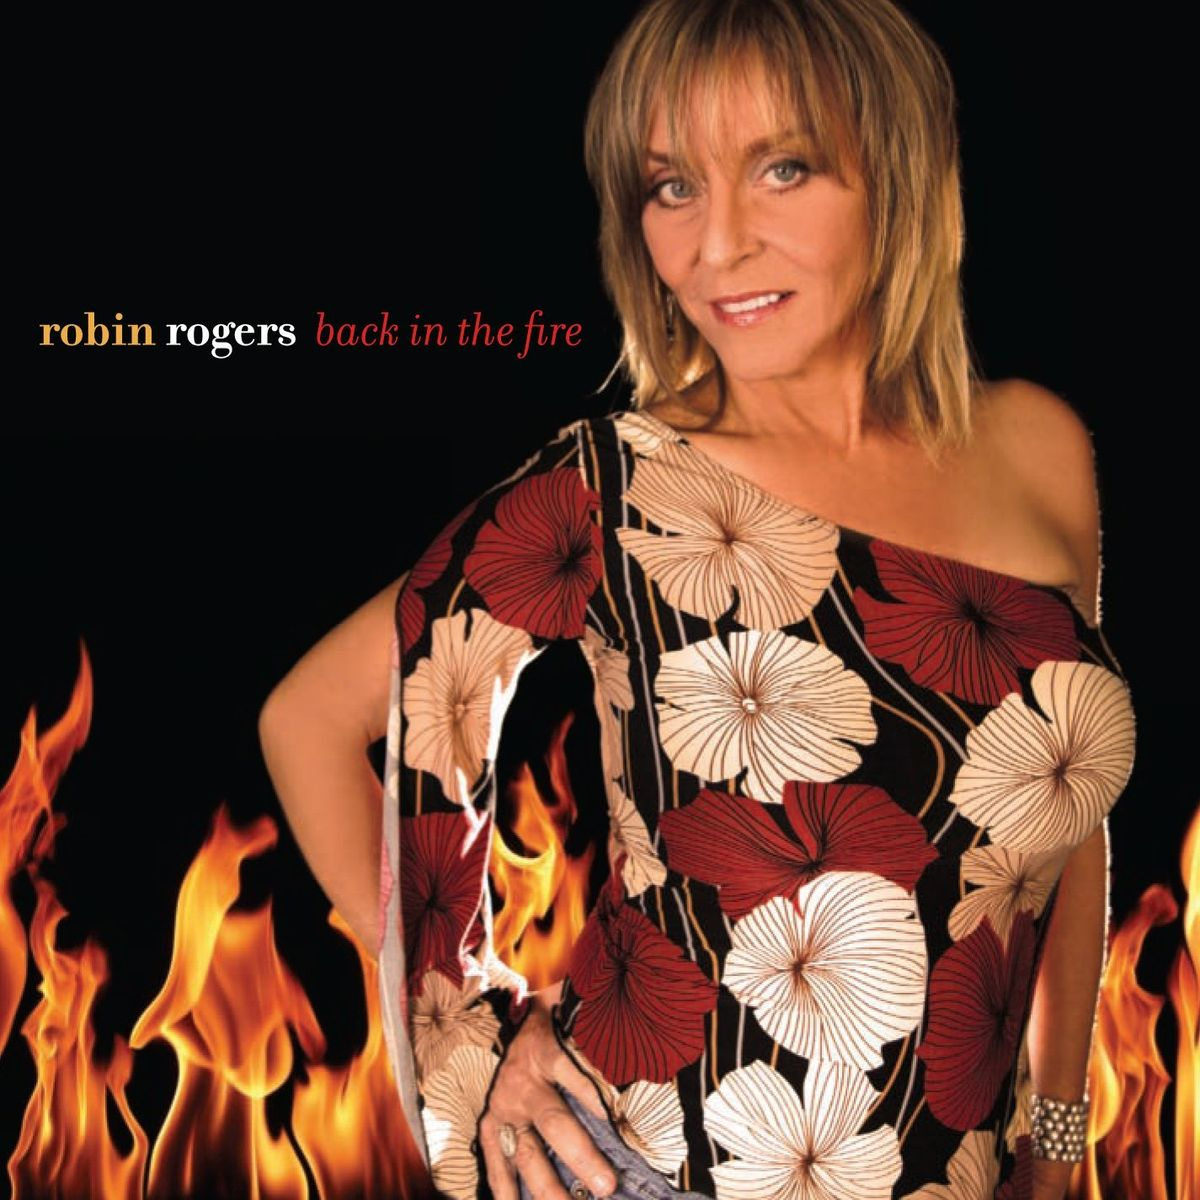 Робин Роджерс Robin Rogers. Back In The Fire